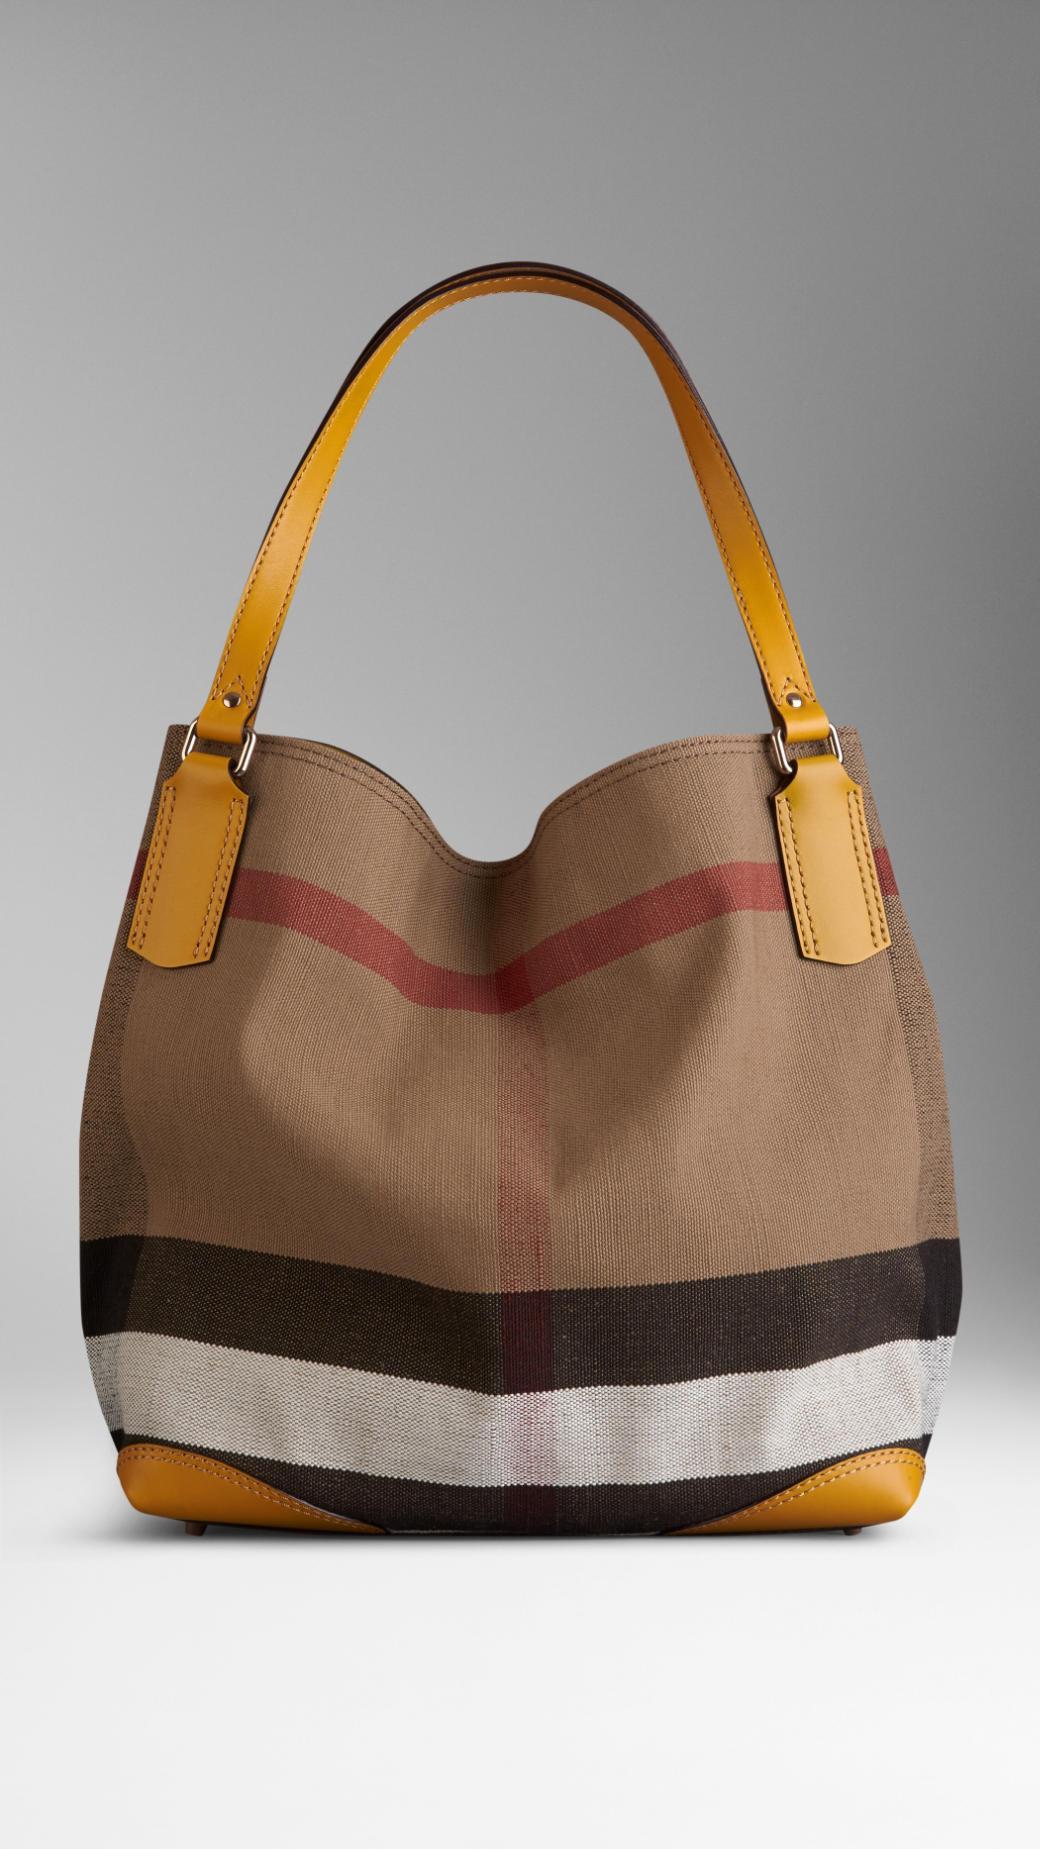 de58d3262452 Lyst - Burberry Medium Canvas Check Tote Bag in Yellow